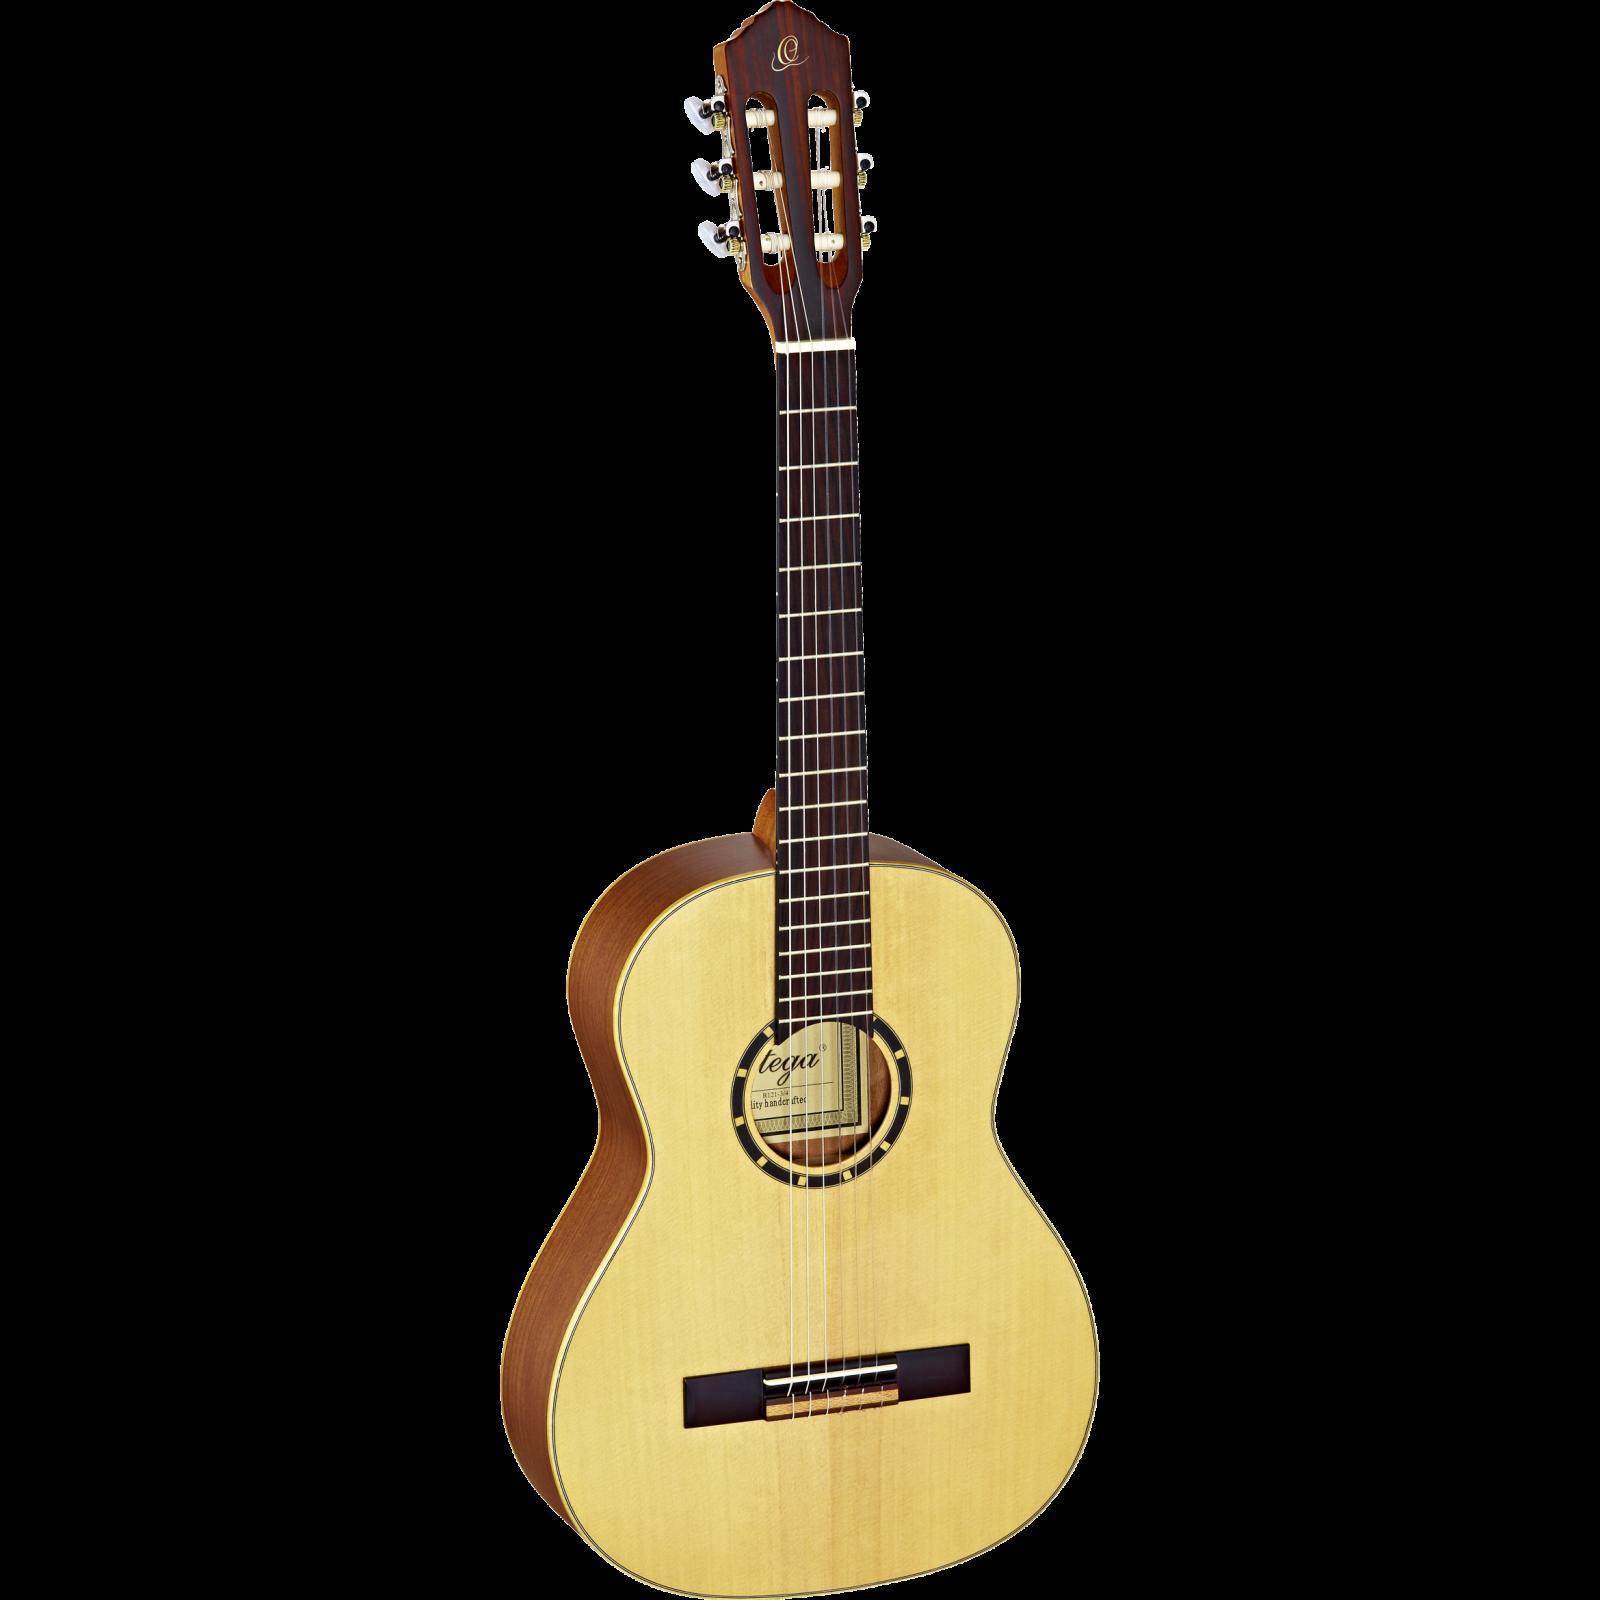 Ortega Family Series R121-3/4 Classical Guitar, 3/4 Size